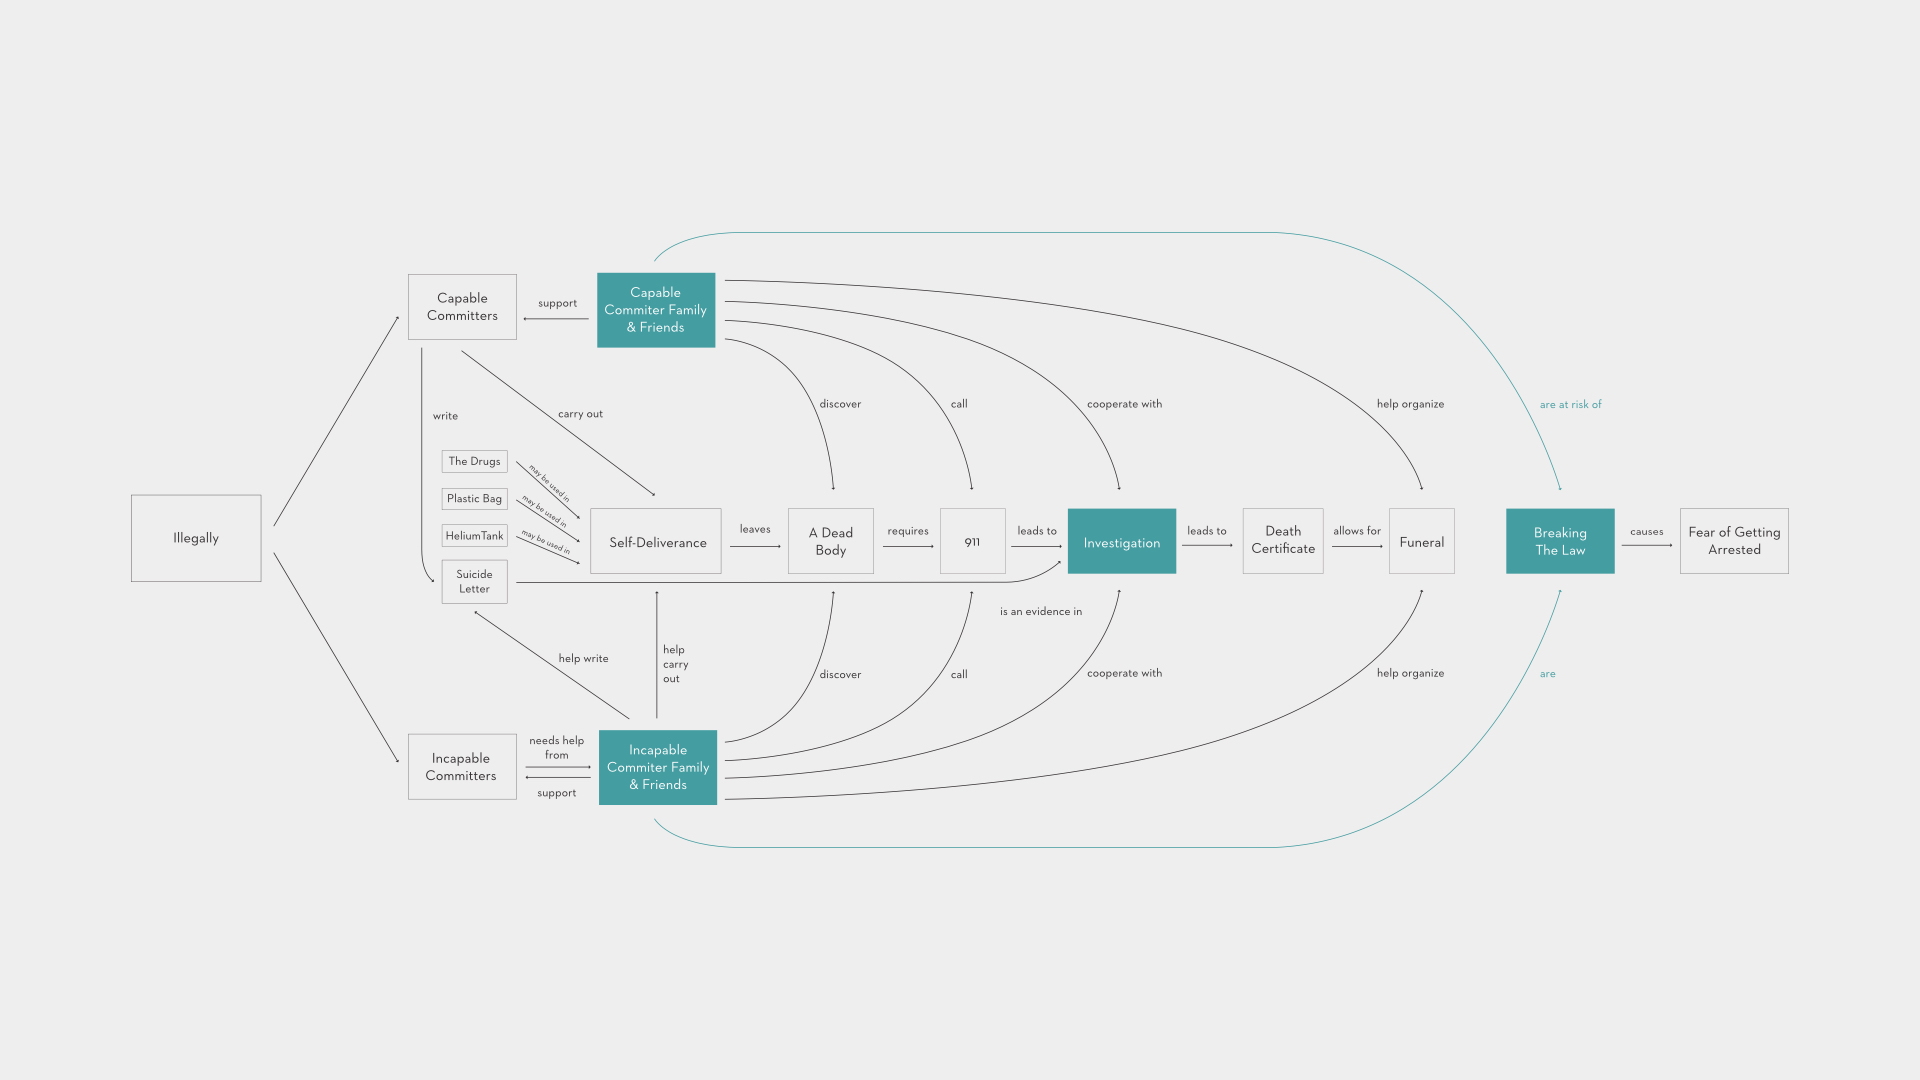 Illegal Process Diagram_Hayashi_1920.jpeg